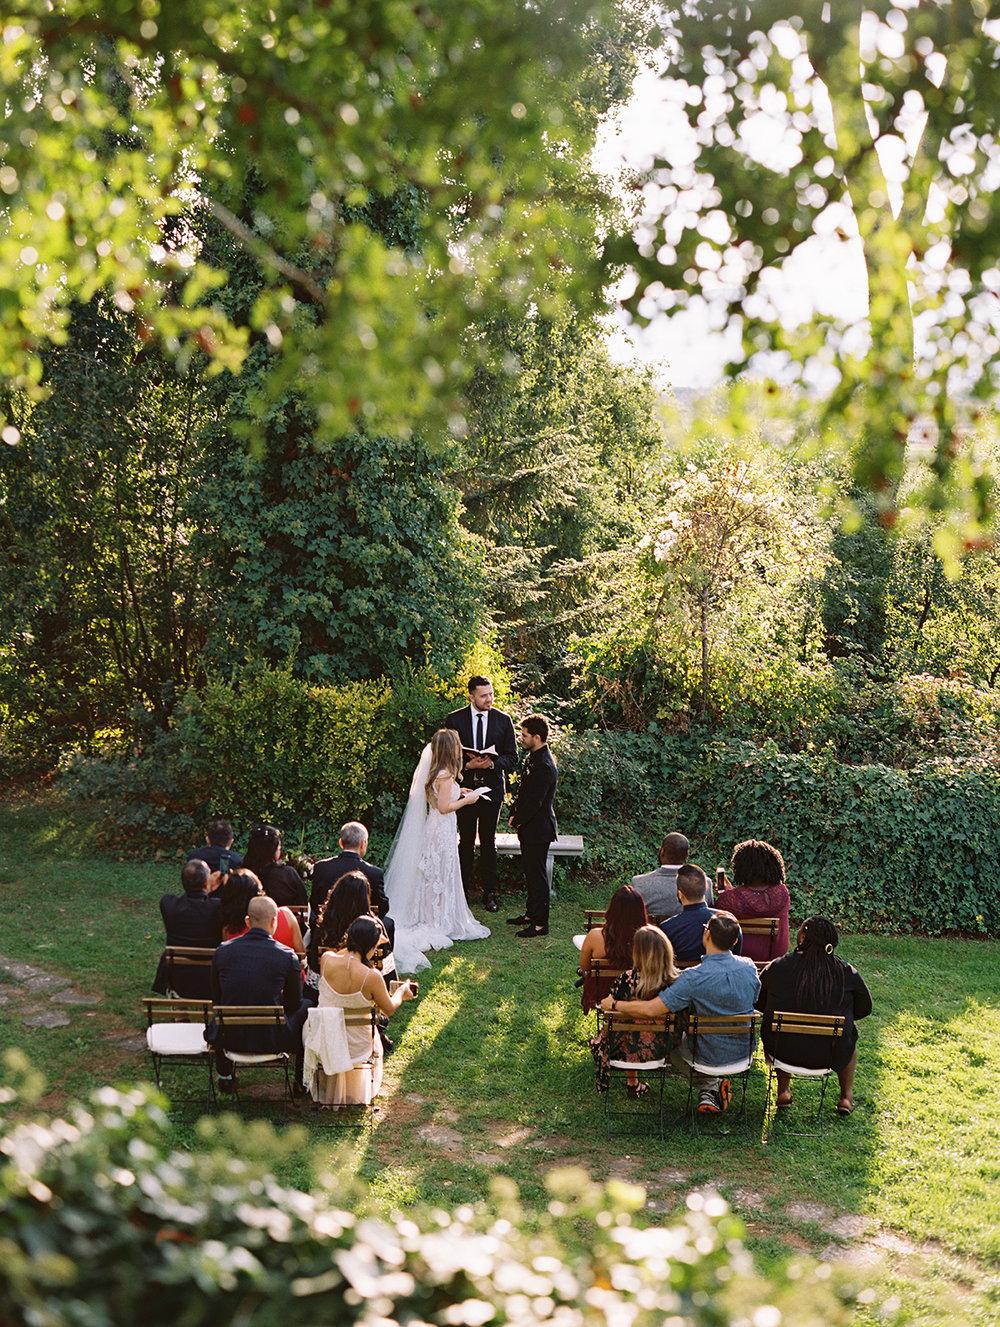 Eli-Savannah-Wedding-Italy-Brumley-Wells-Photography-291.jpg